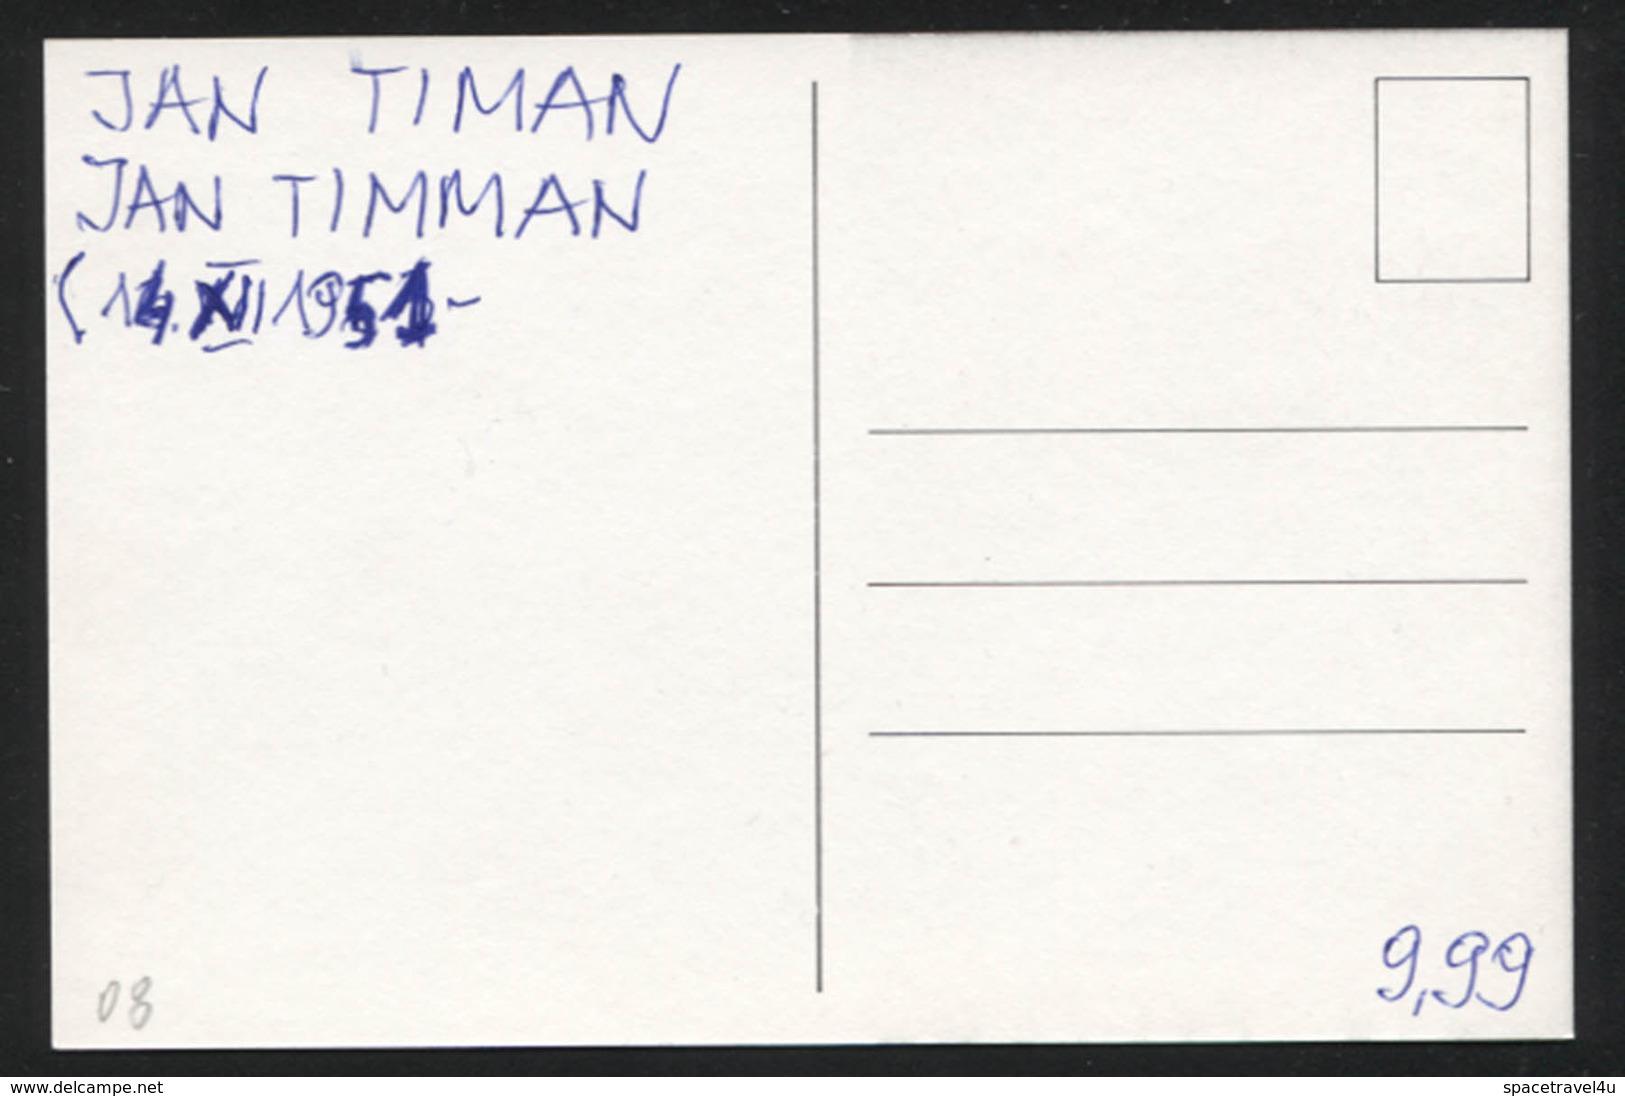 Jan Timman -  Dutch Chess Grandmaster -  Postcard - (CHESS-08) - Cartes Postales